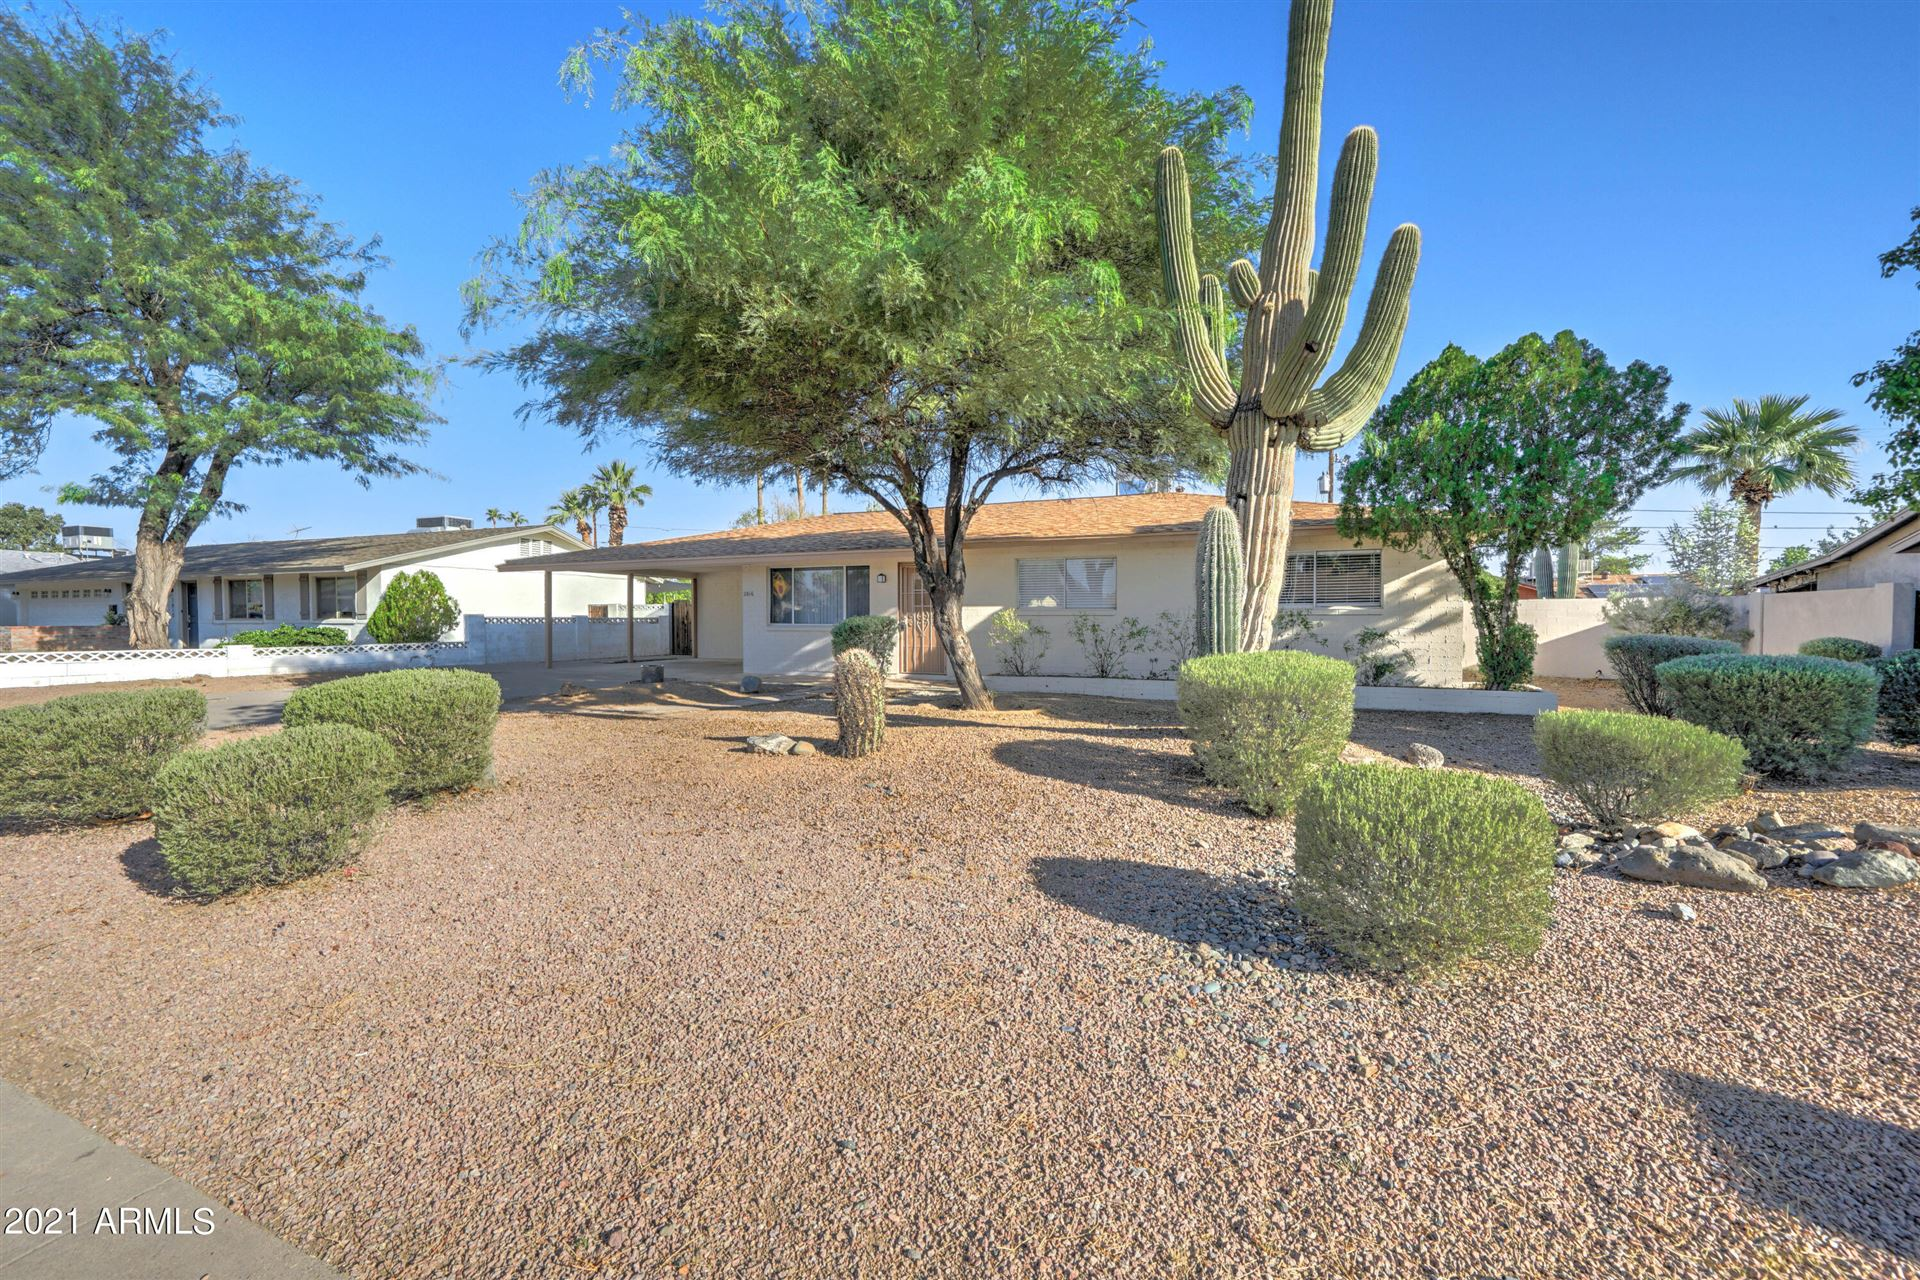 2816 E CHOLLA Street, Phoenix, AZ 85028 - MLS#: 6297481